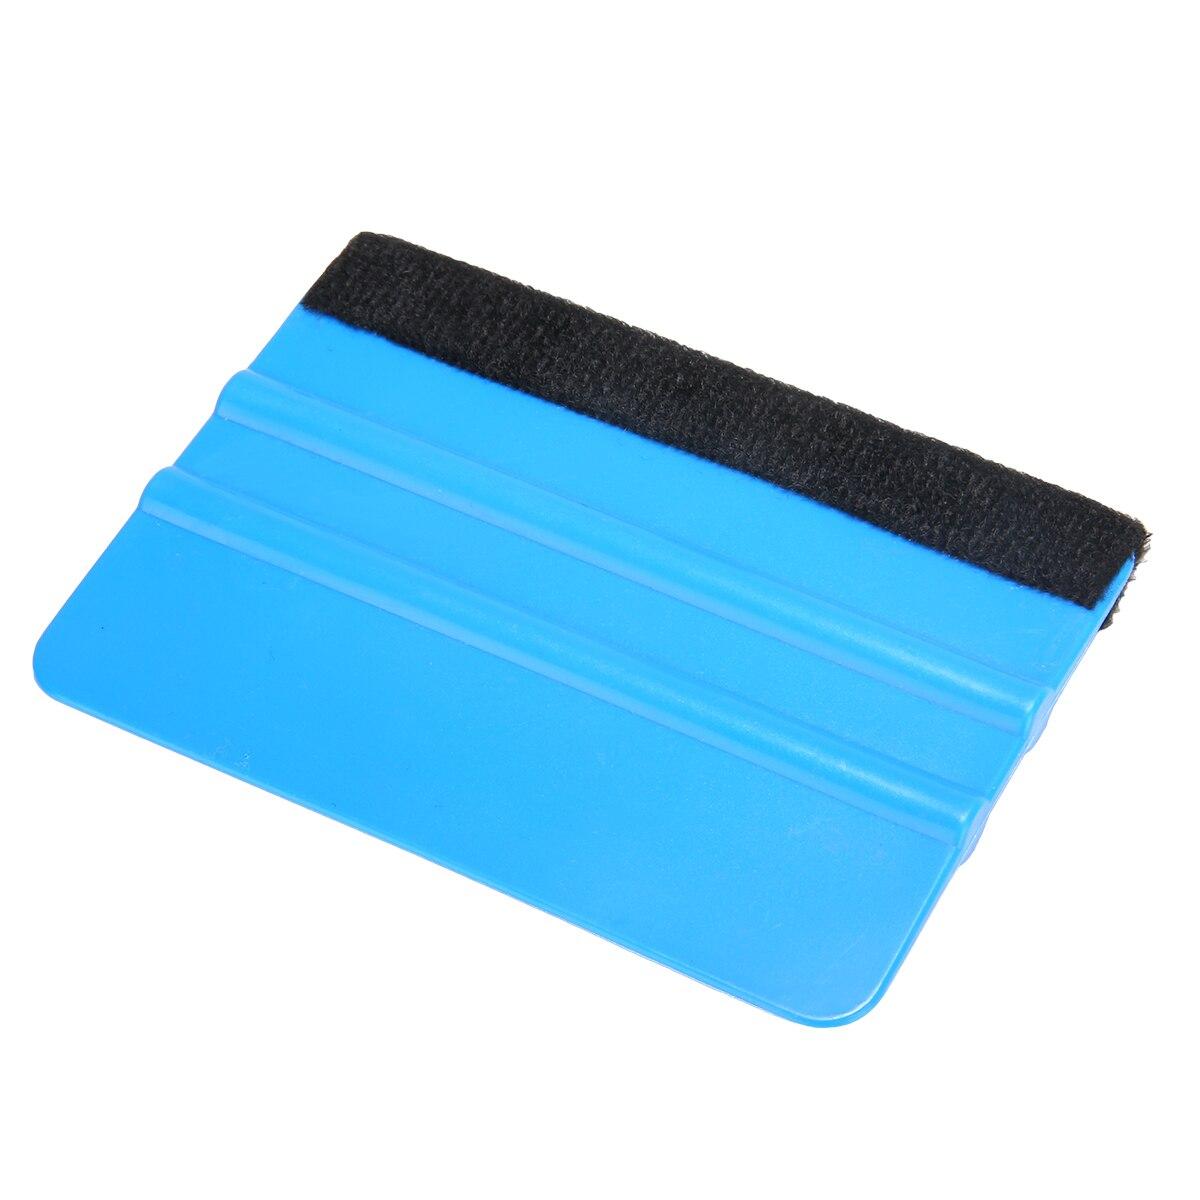 Blue Plastic Car Vinyl Squeegee Blade Decal Wrap Application Tool Soft Felt Edge Scraper